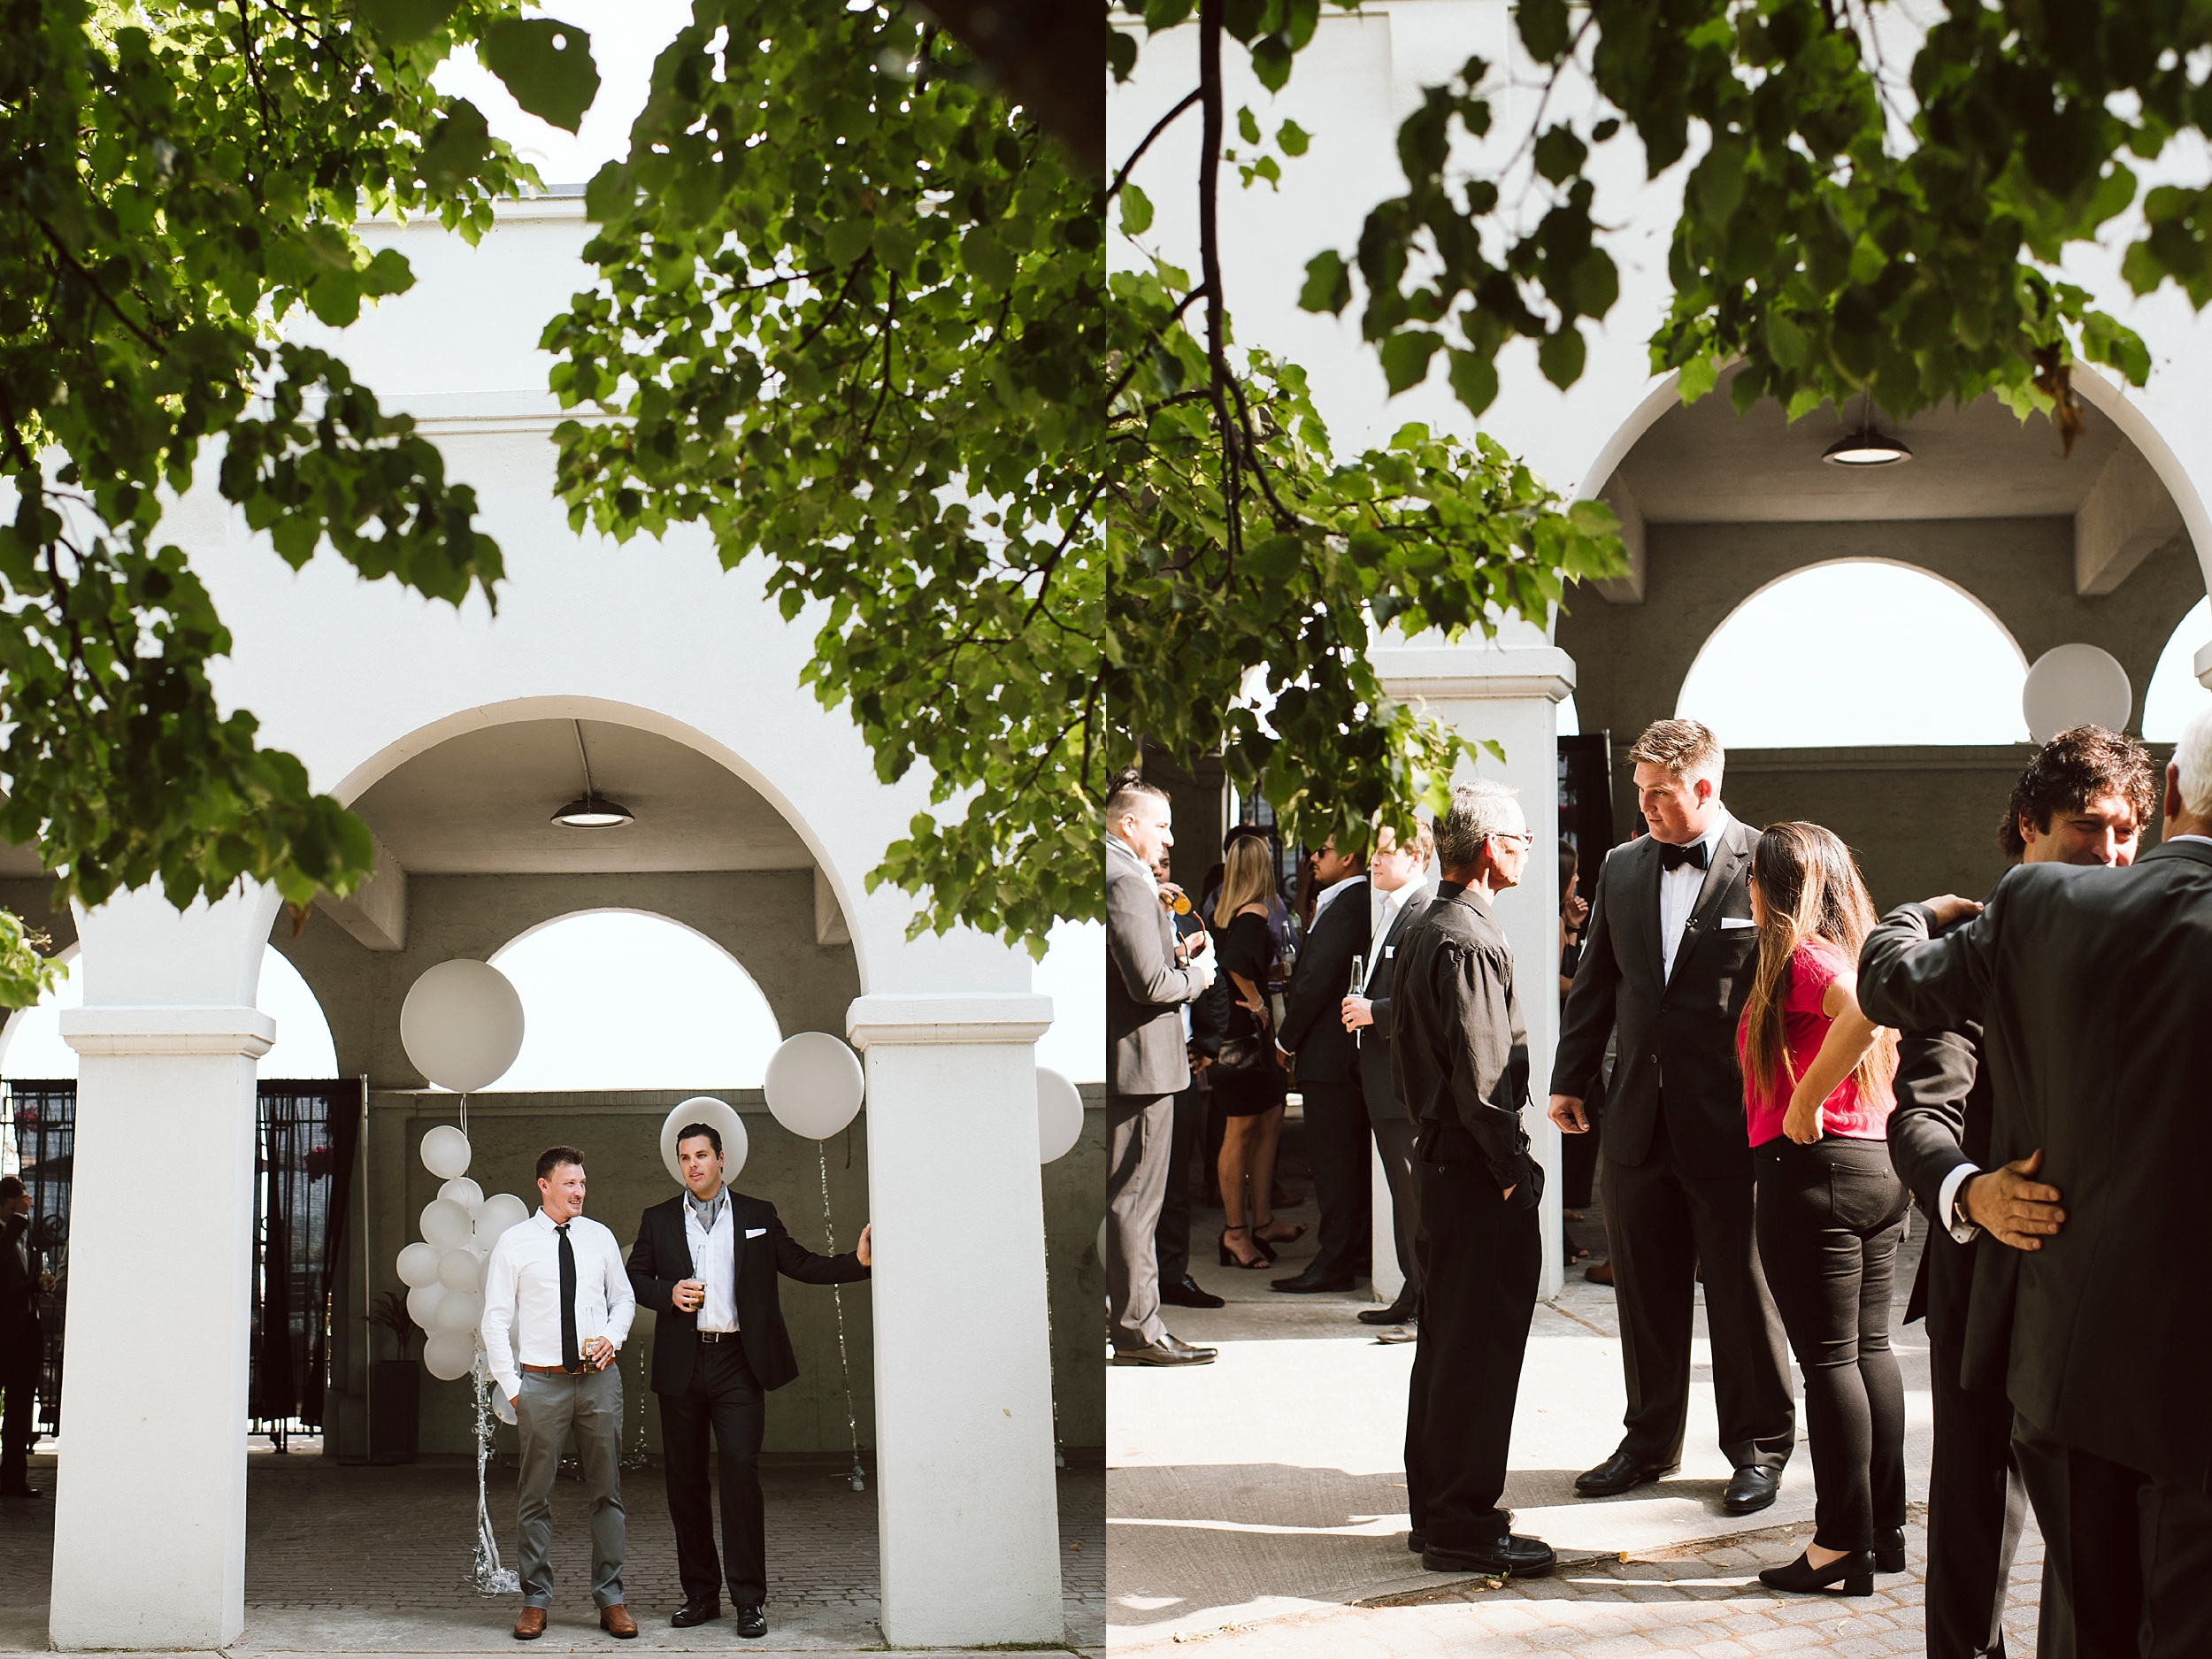 Sunnyside_Pavilion_Wedding_Toronto_Photographer_0036.jpg